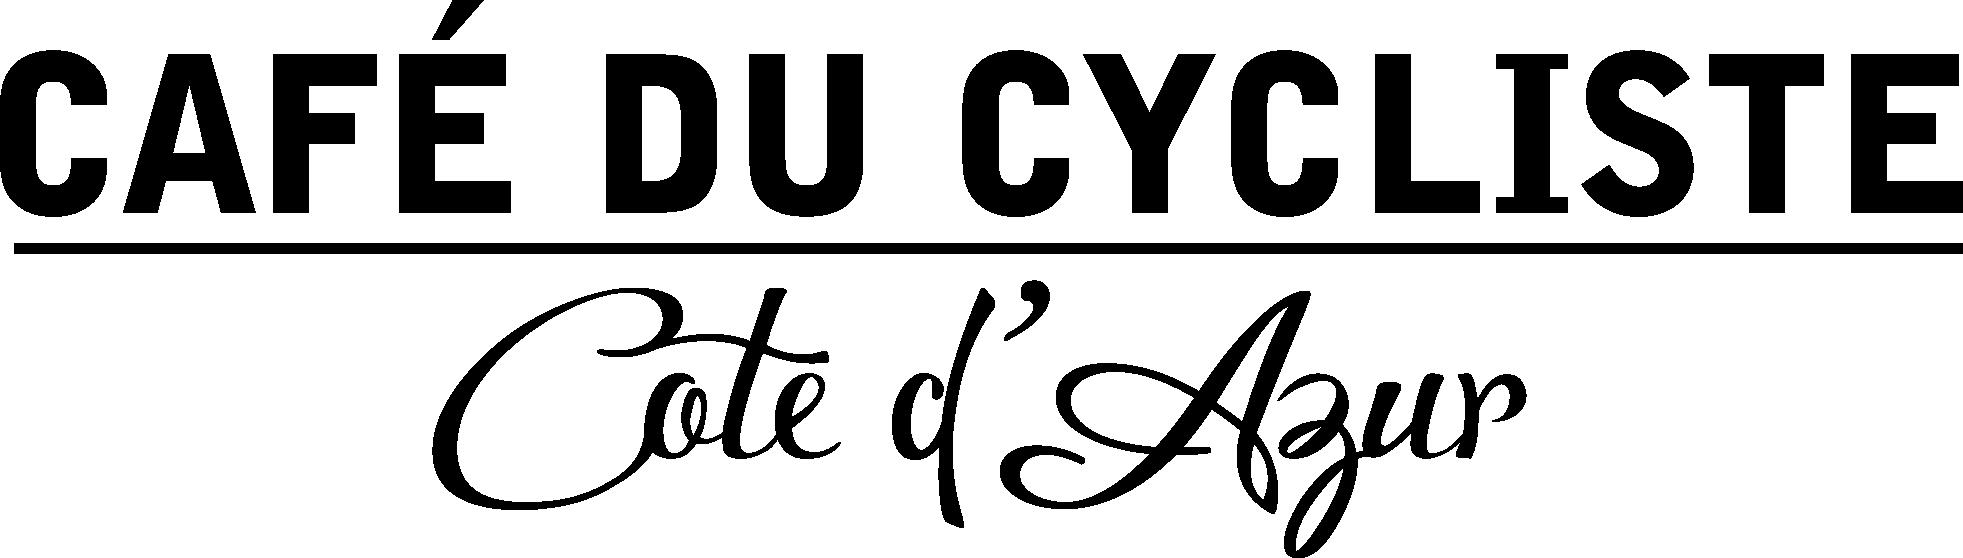 CDC-logo-noir.png